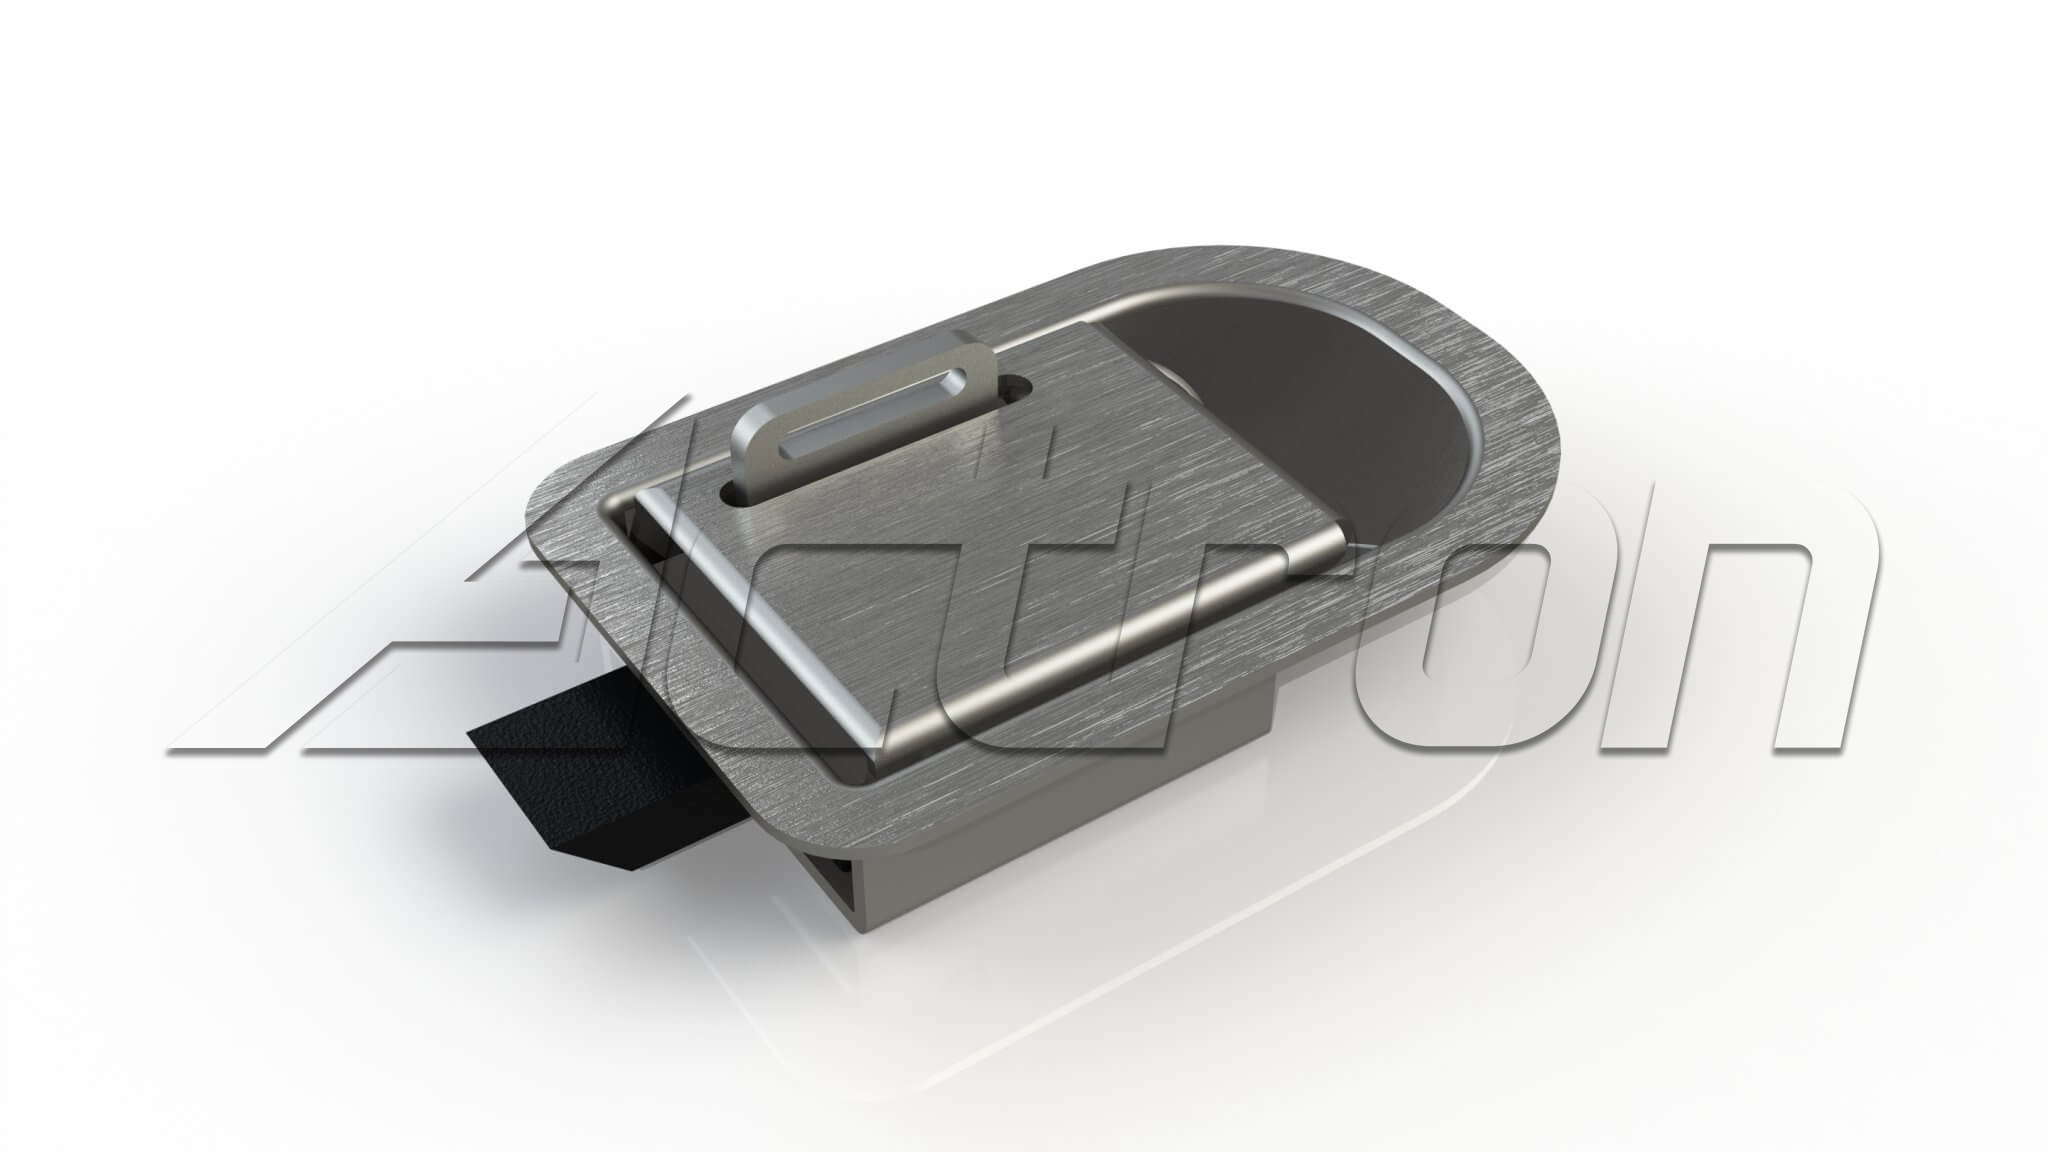 latch-assy-8211-paddle-4223-a23544.jpg